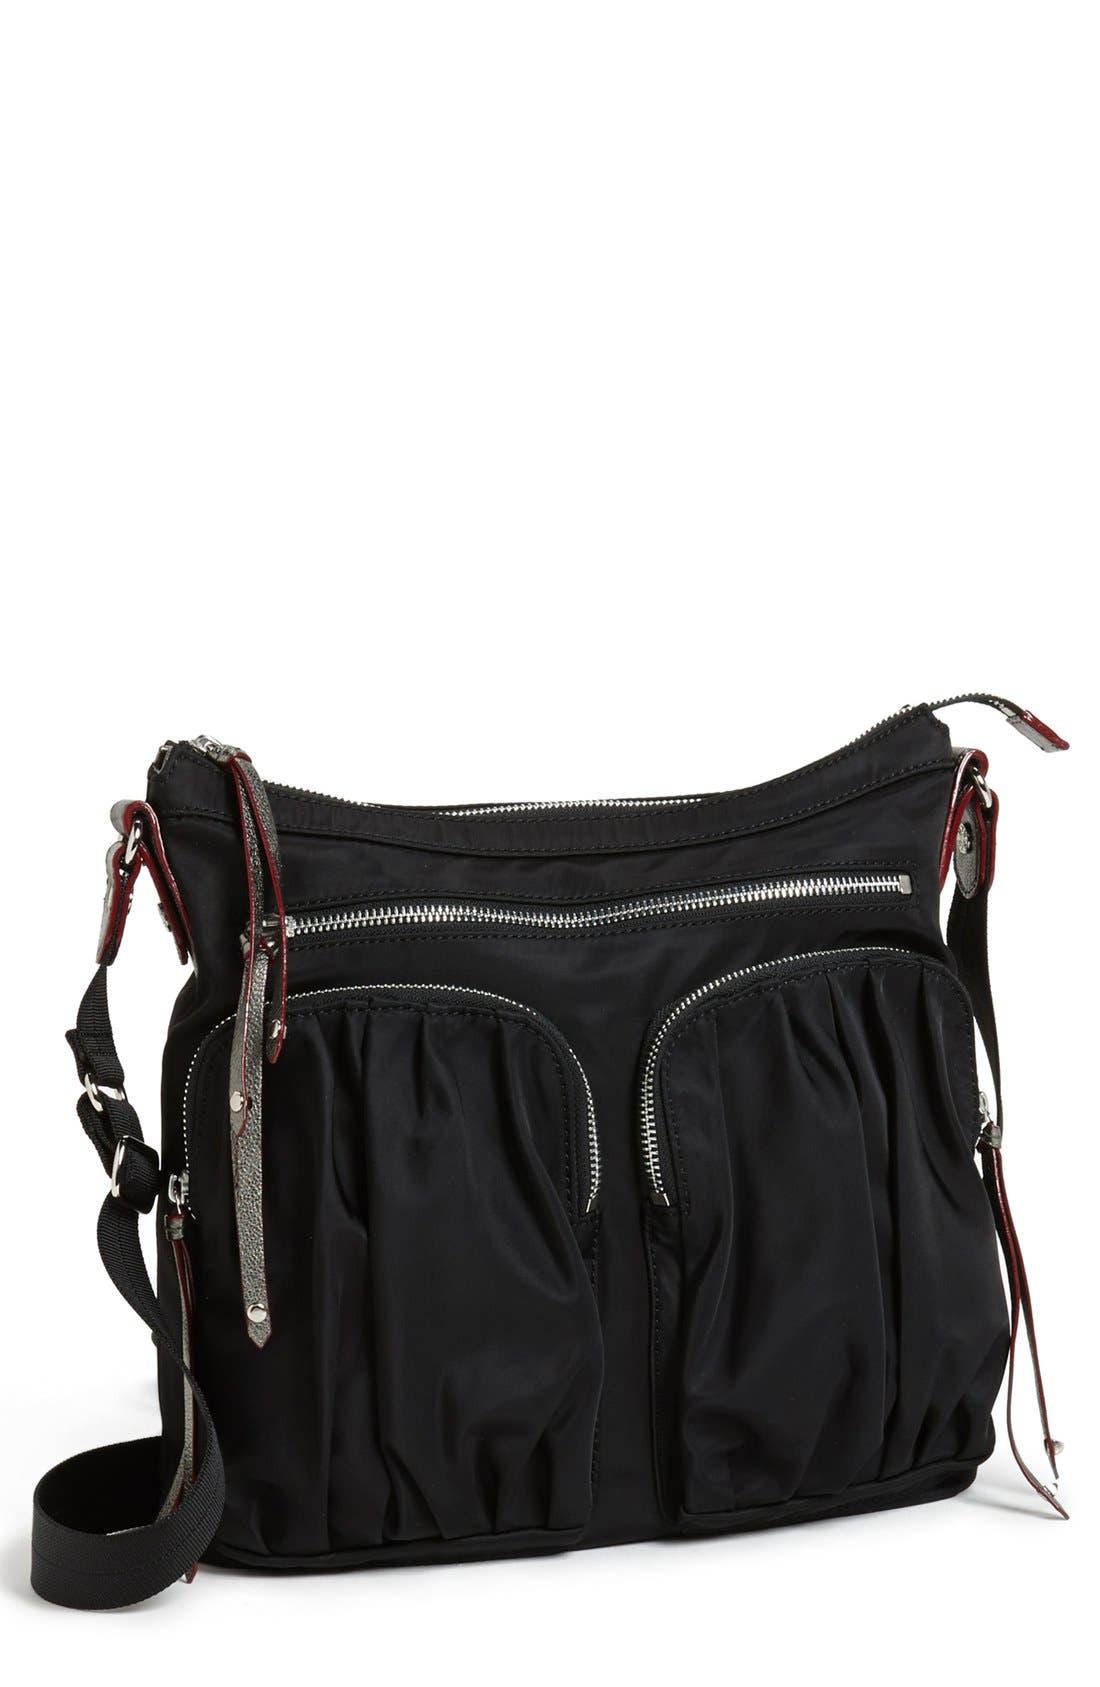 Alternate Image 1 Selected - MZ Wallace 'Mia' Bedford Nylon Crossbody Bag